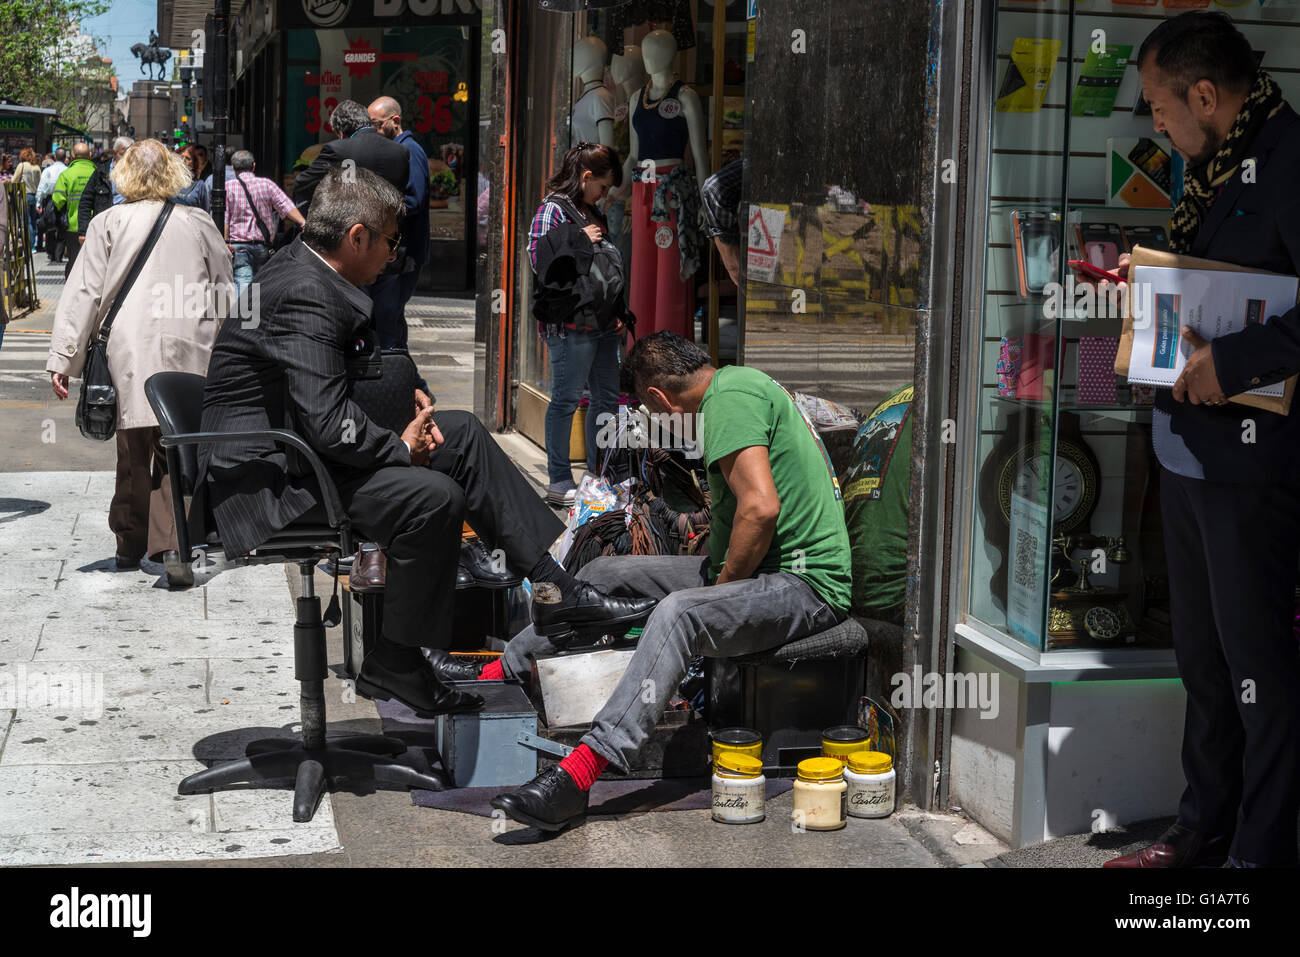 Shoe shining on Avenida de Mayo, Buenos Aires, Argentina - Stock Image